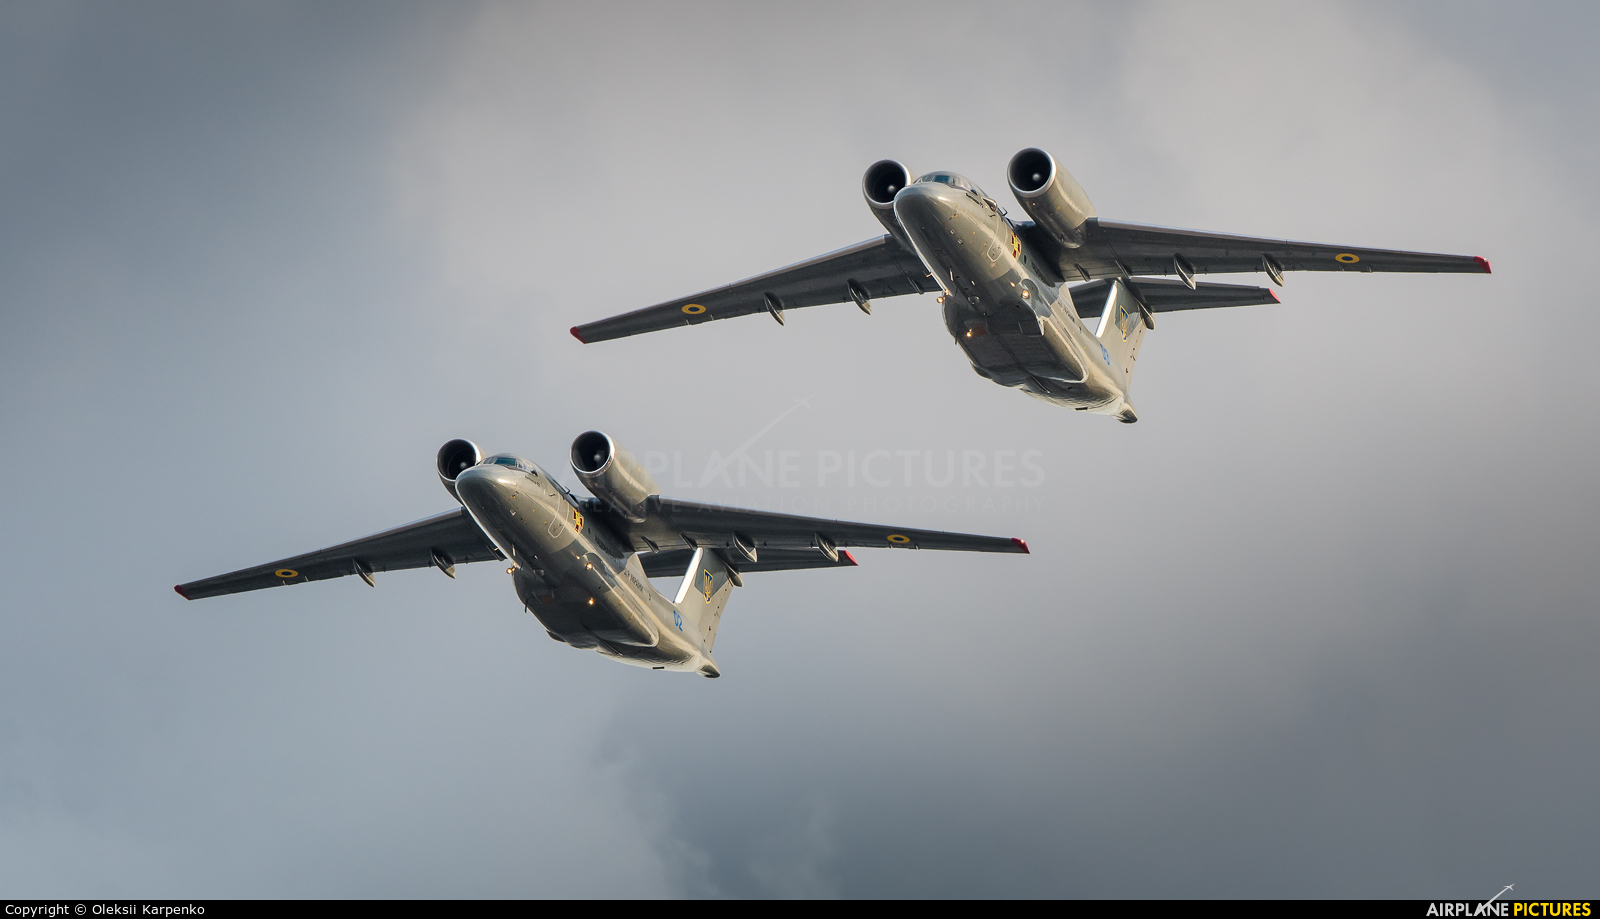 Ukraine - National Guard 03 BLUE aircraft at In Flight - Ukraine